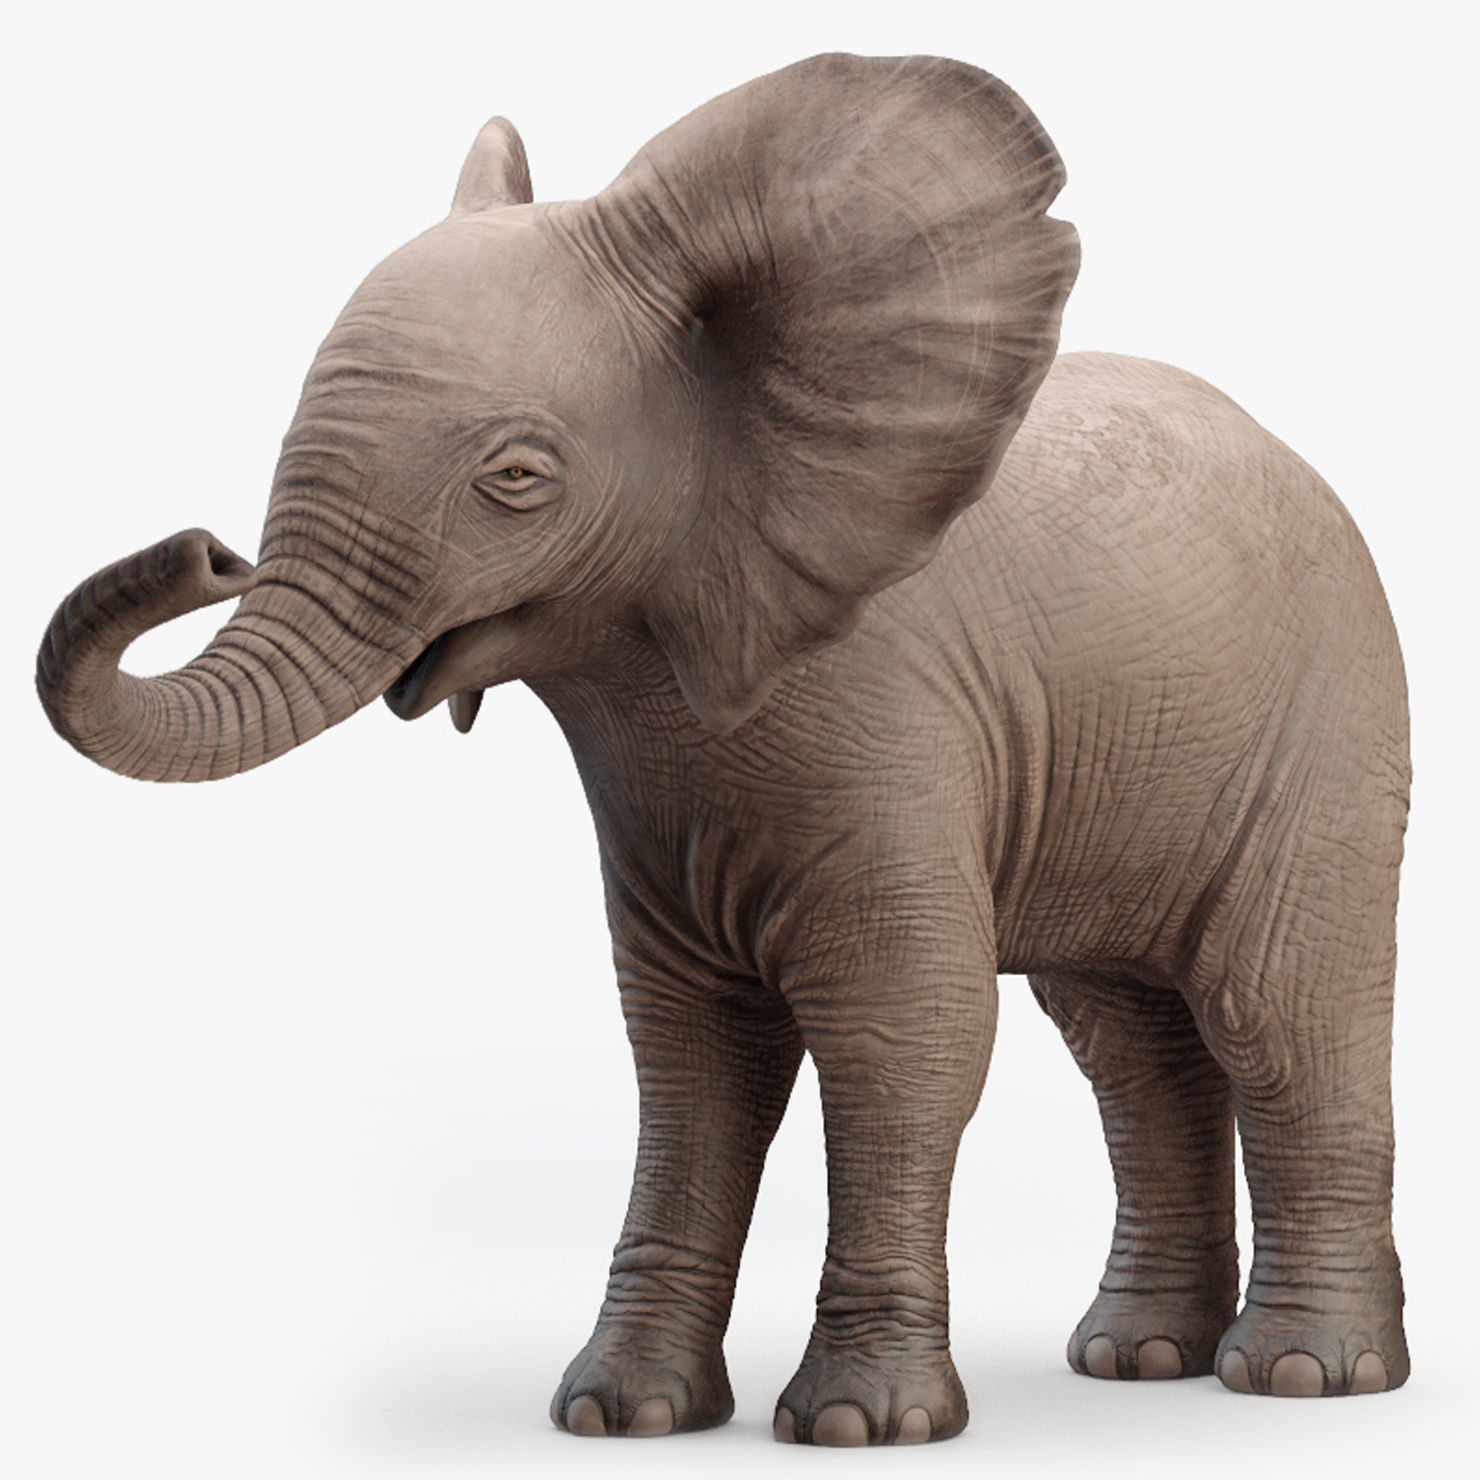 Elephant Baby Rigged 8K